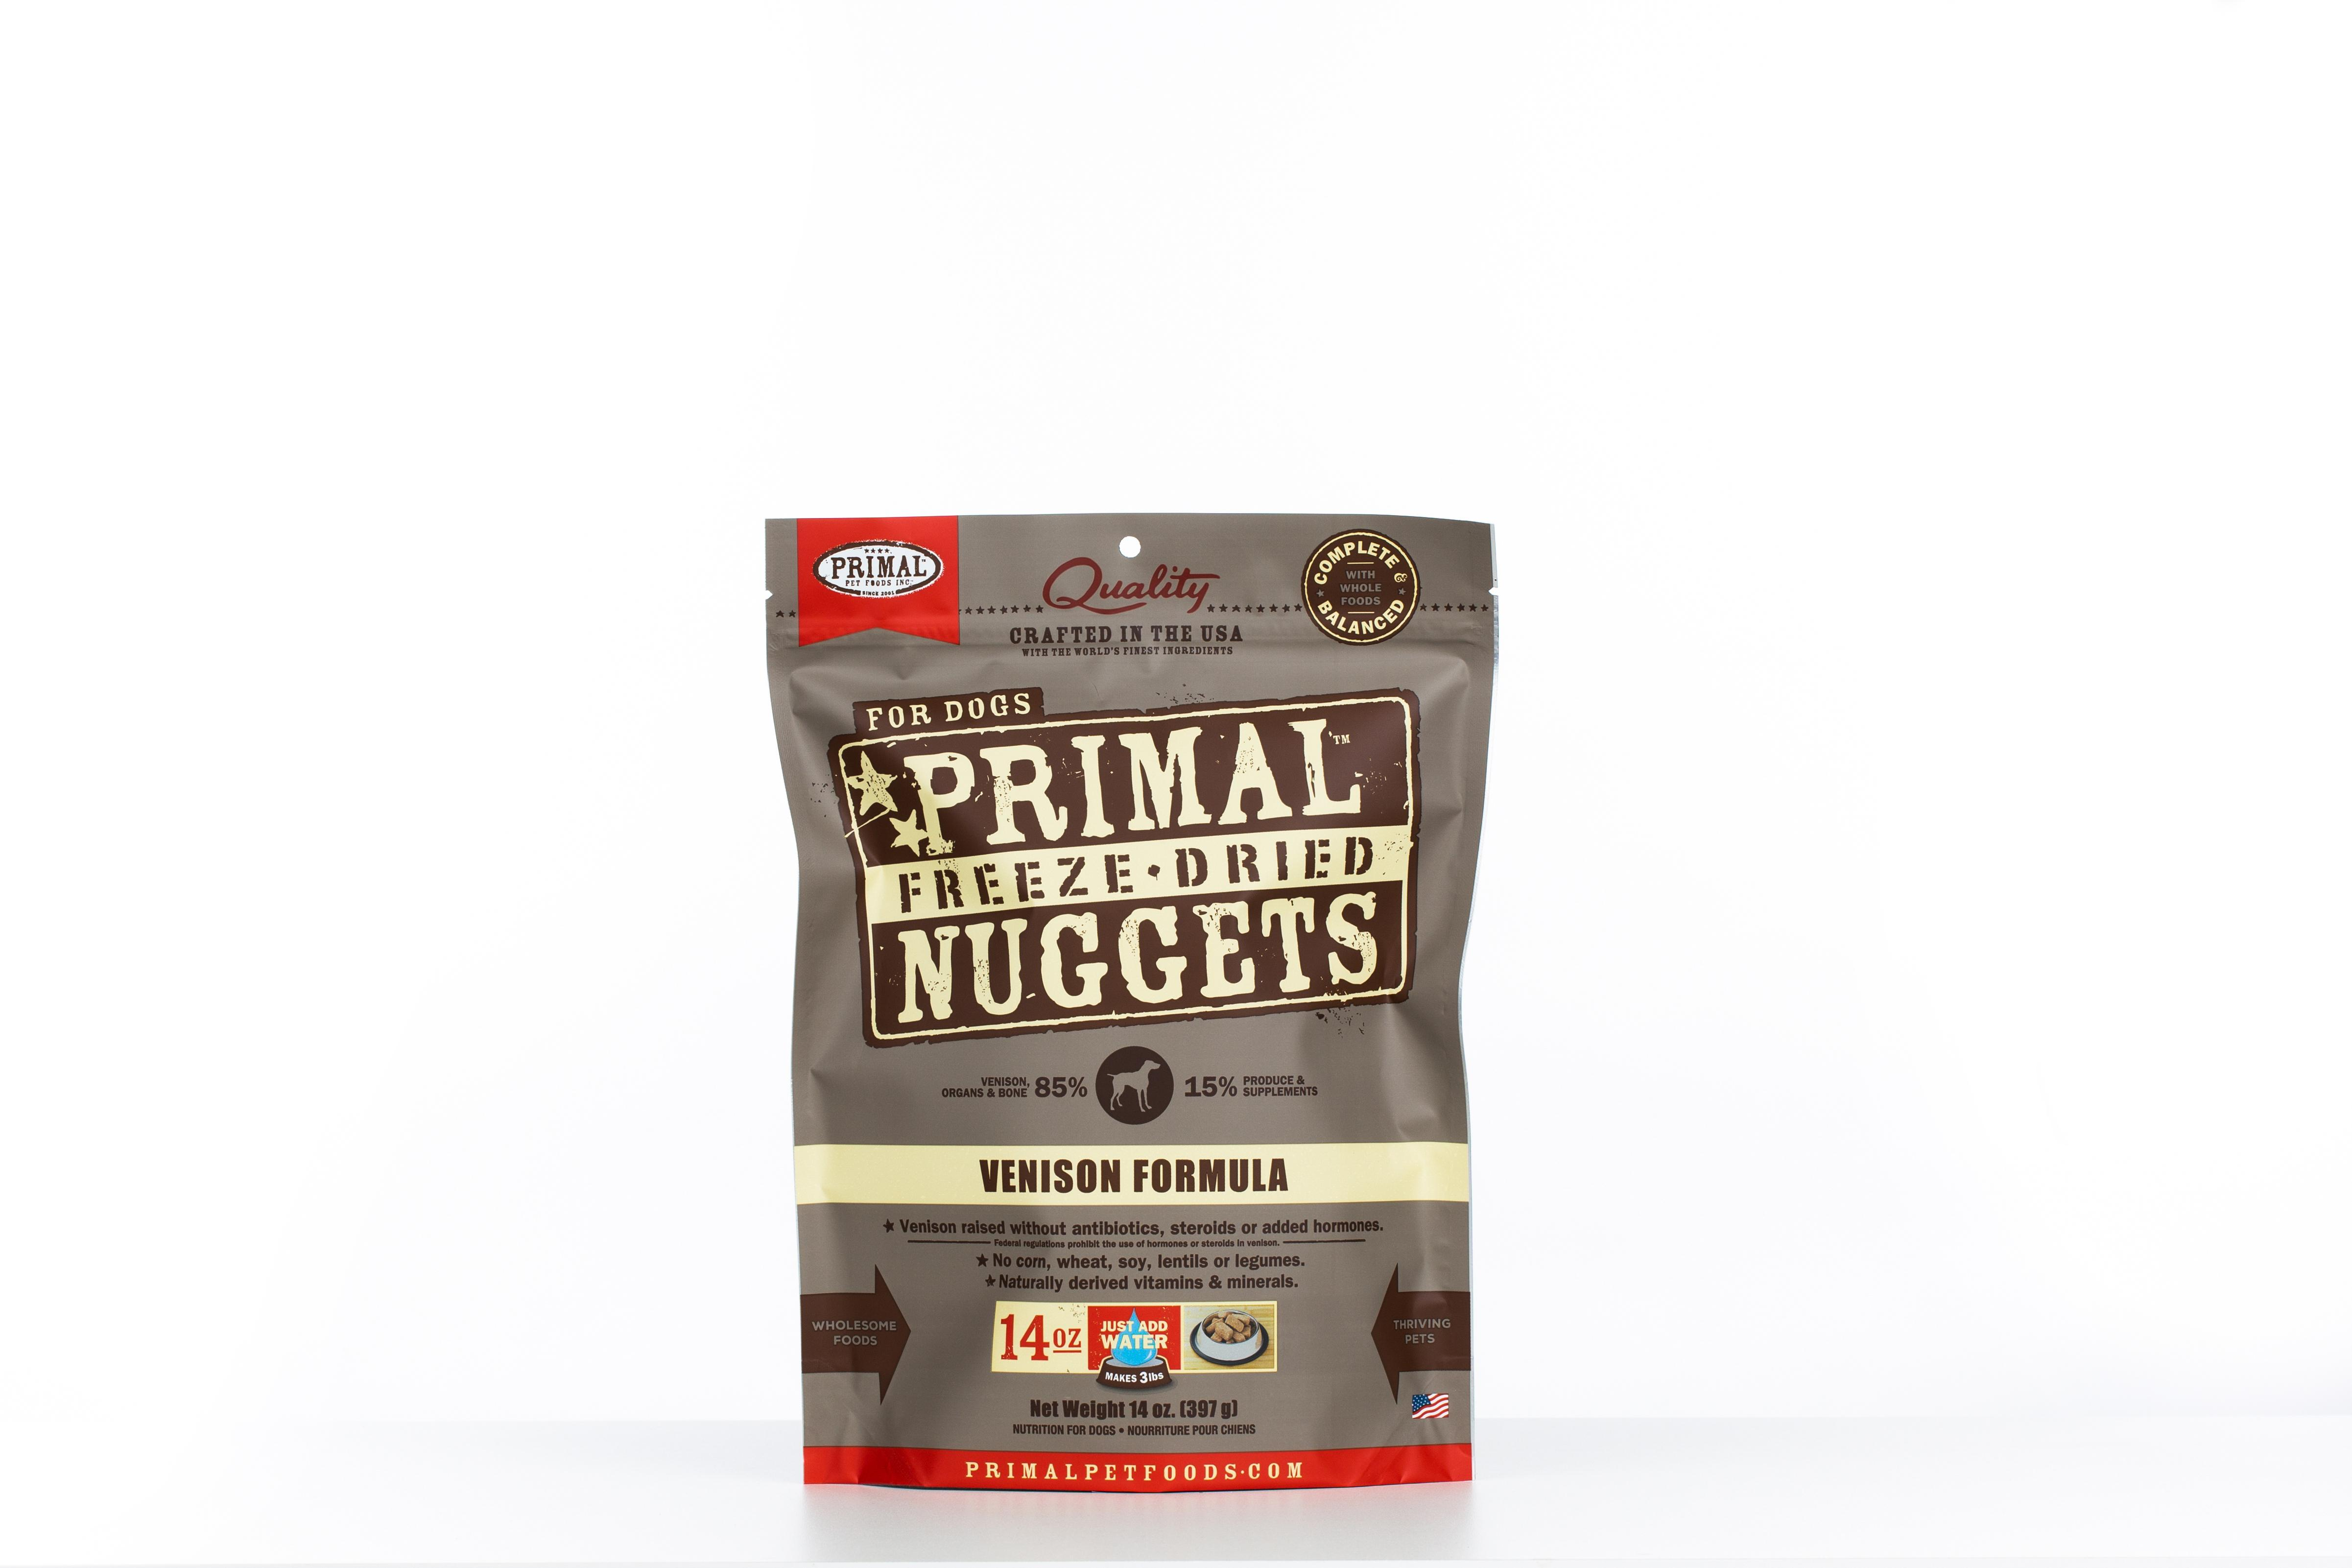 Primal Venison Formula Nuggets Grain-Free Raw Freeze-Dried Dog Food, 14-oz